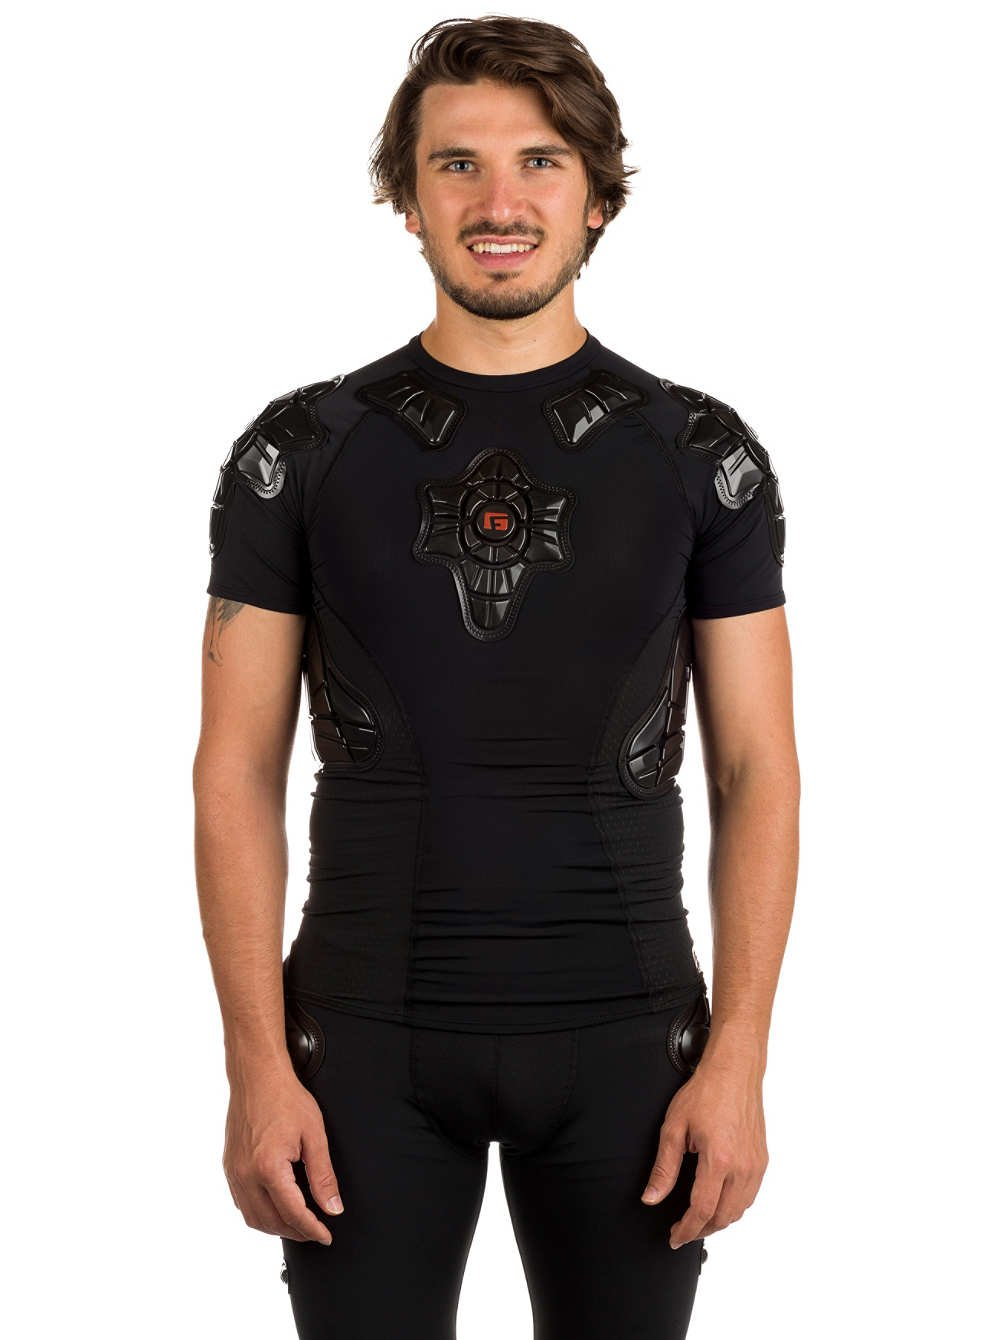 G-Form Pro-X Short Sleeve Compression Shirt, Black, Small